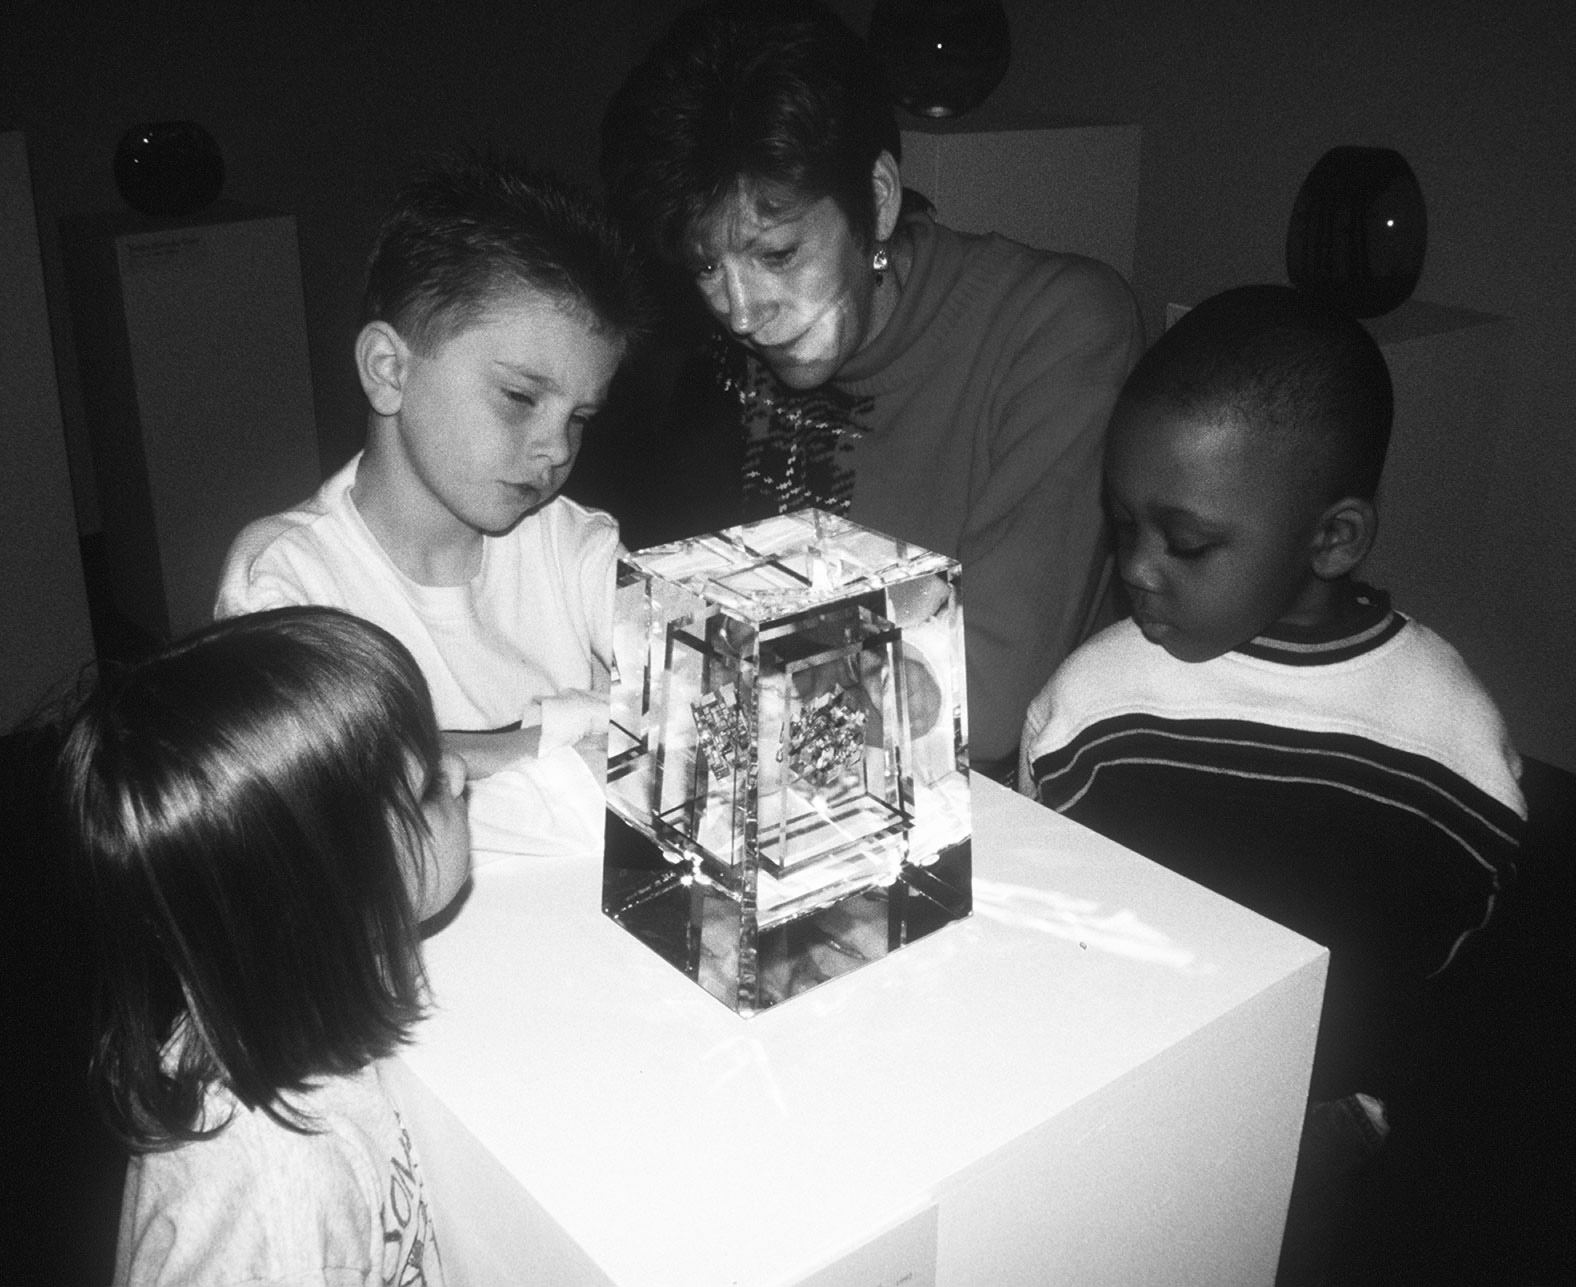 Preschoolers examine a glass sculpture in a Pint Size Picassos class, 2000